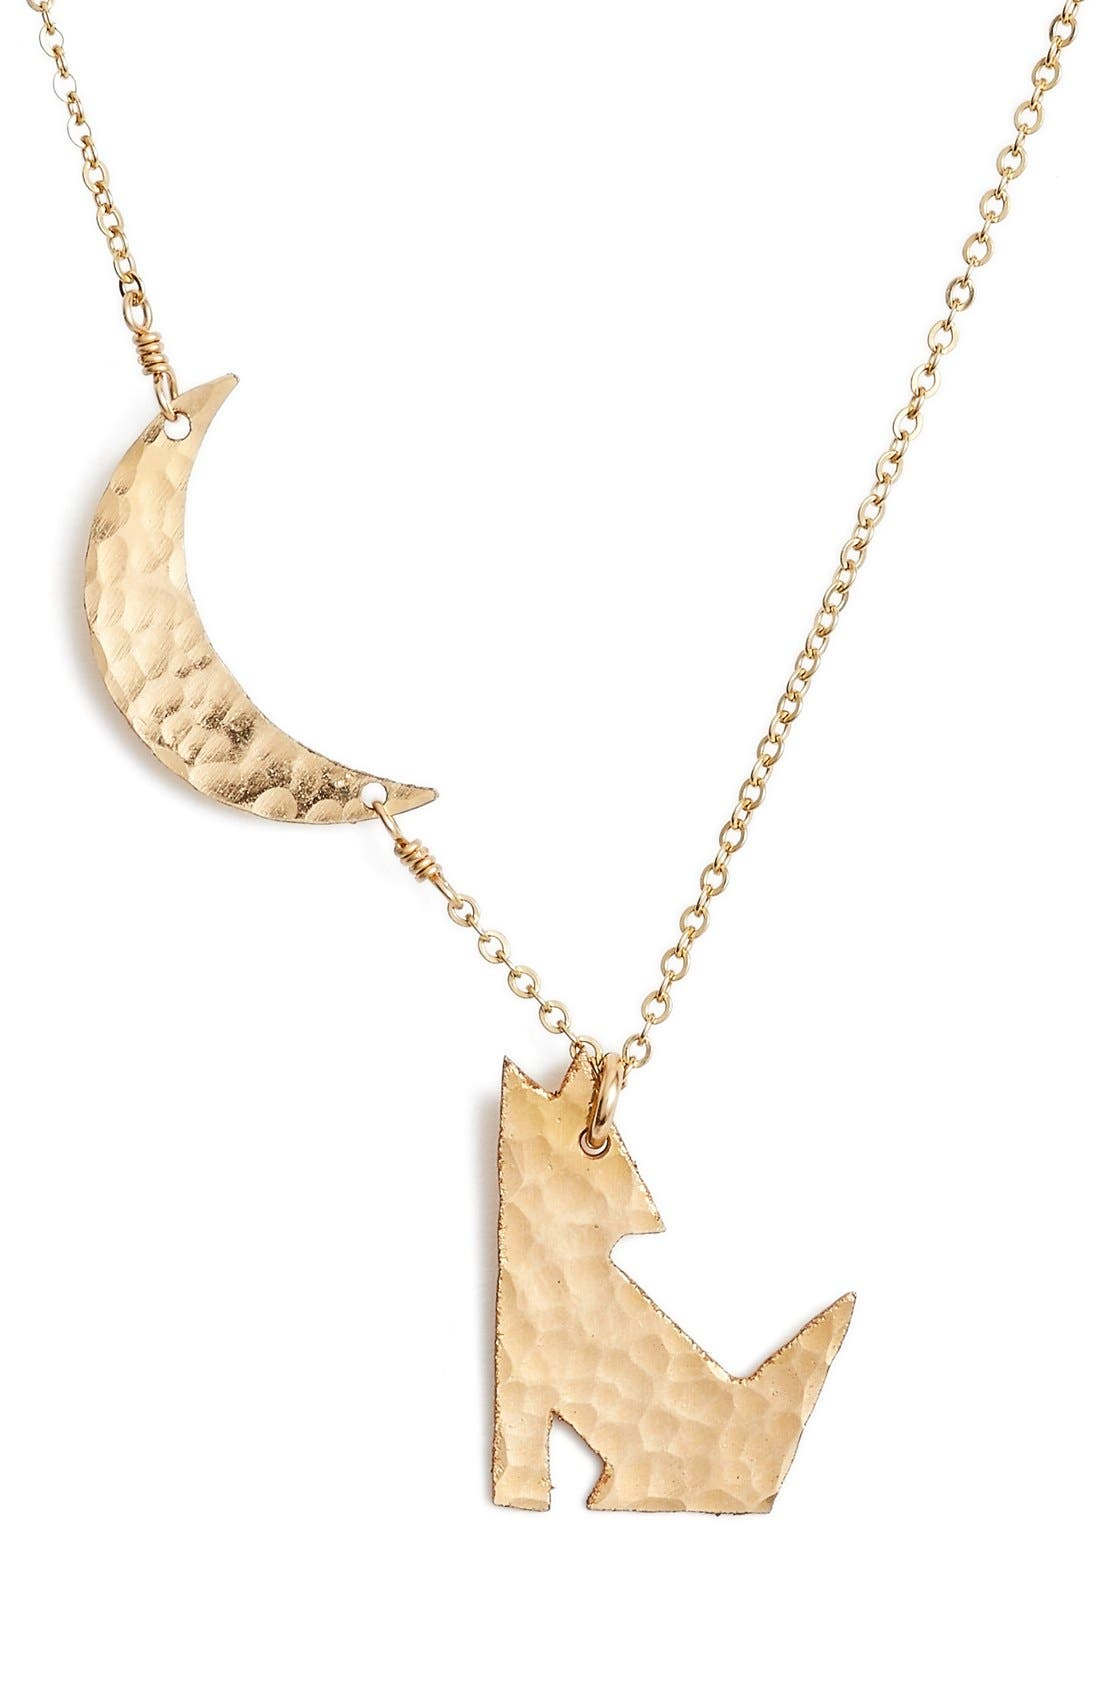 nashelle coyote pendant necklace nordstrom